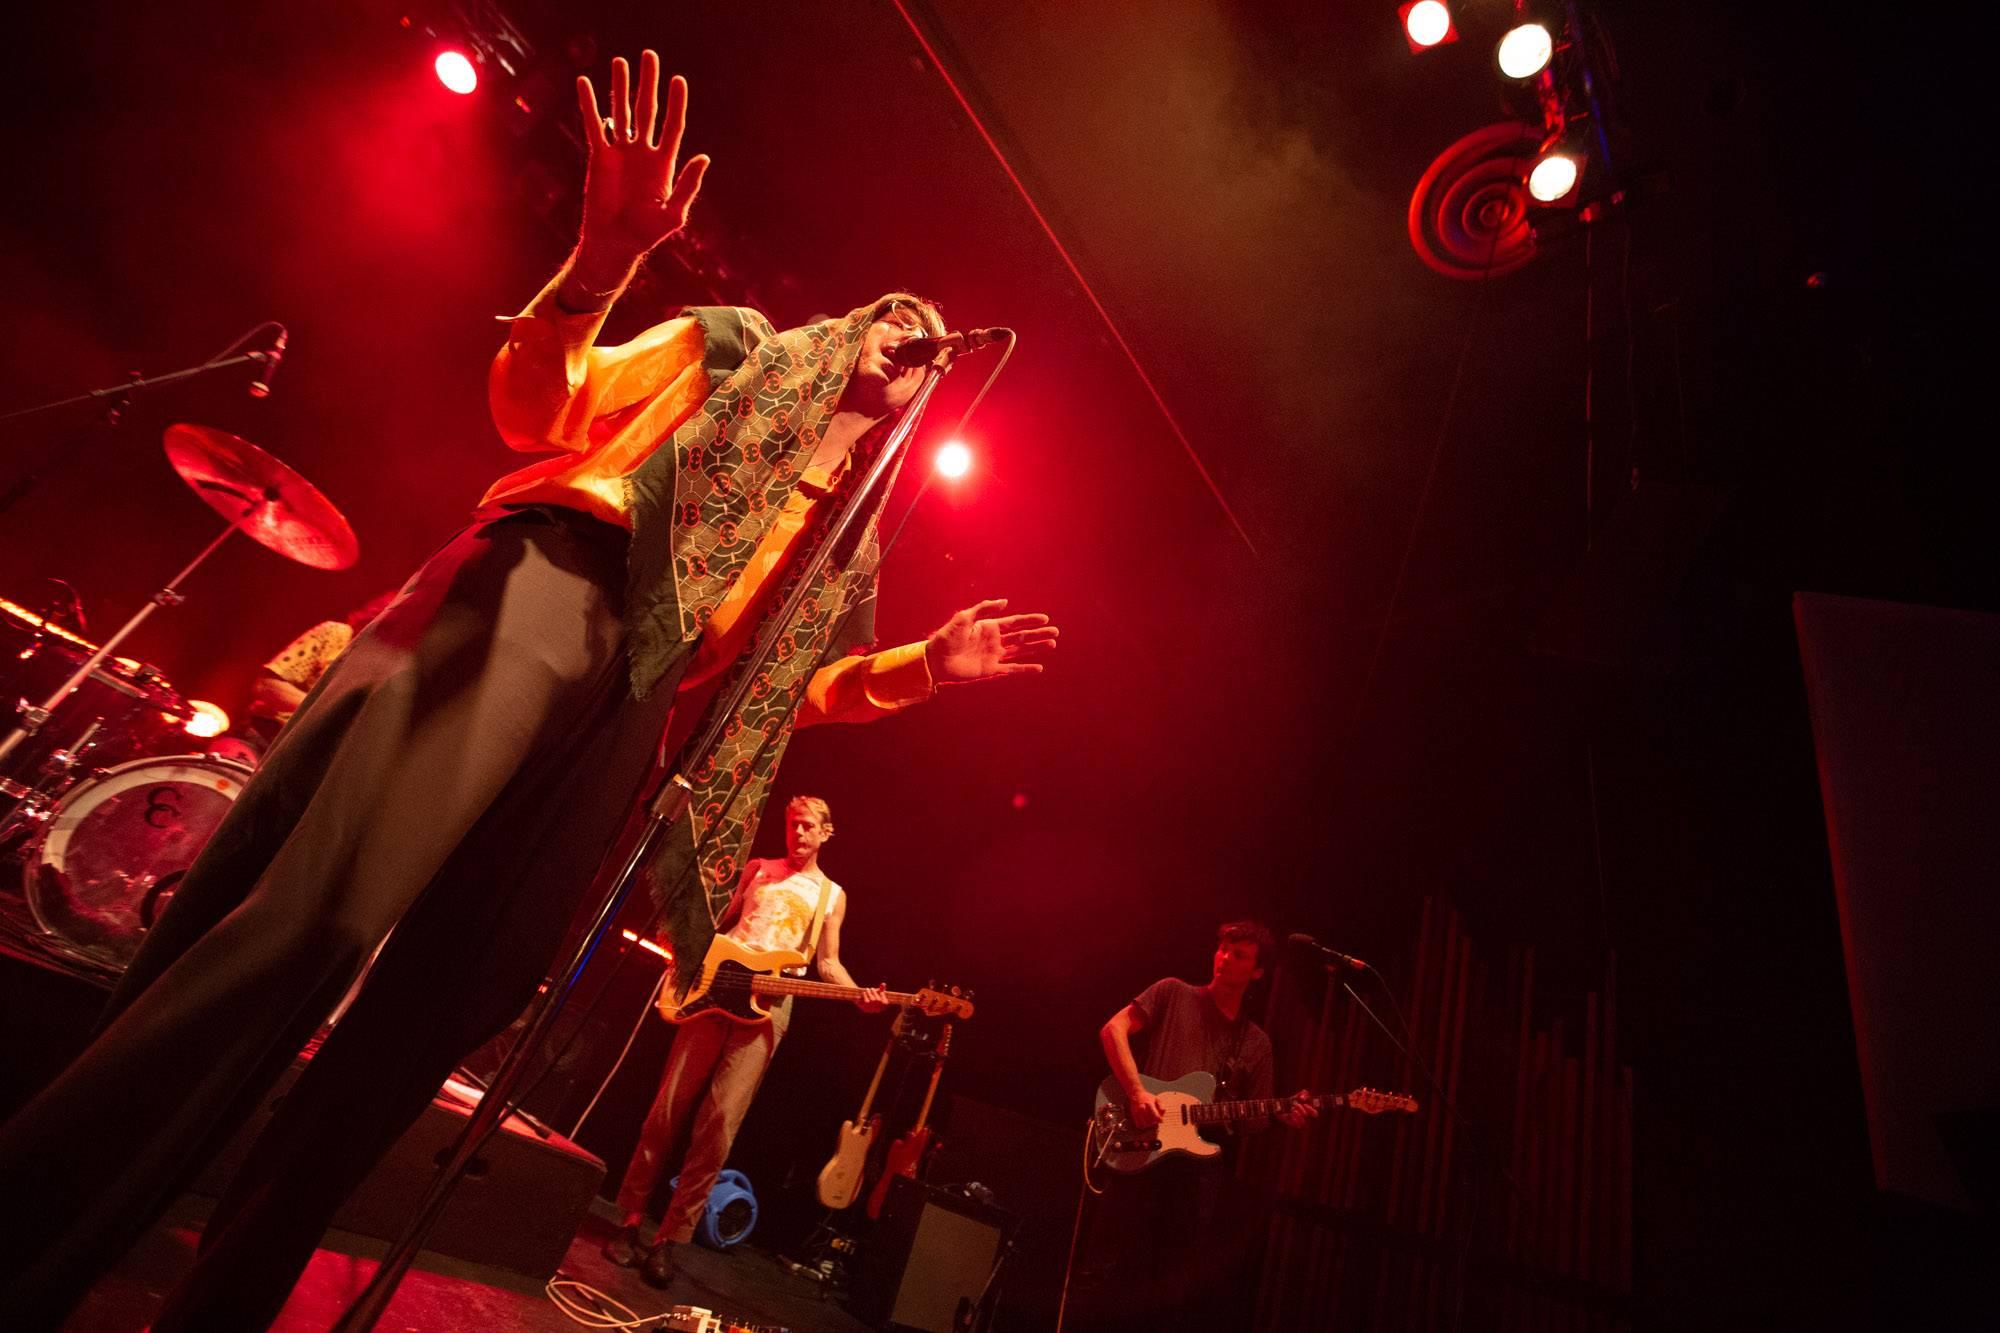 Deerhunter at the Rickshaw Theatre, Vancouver, Jul 22 2019. Kirk Chantraine photo.